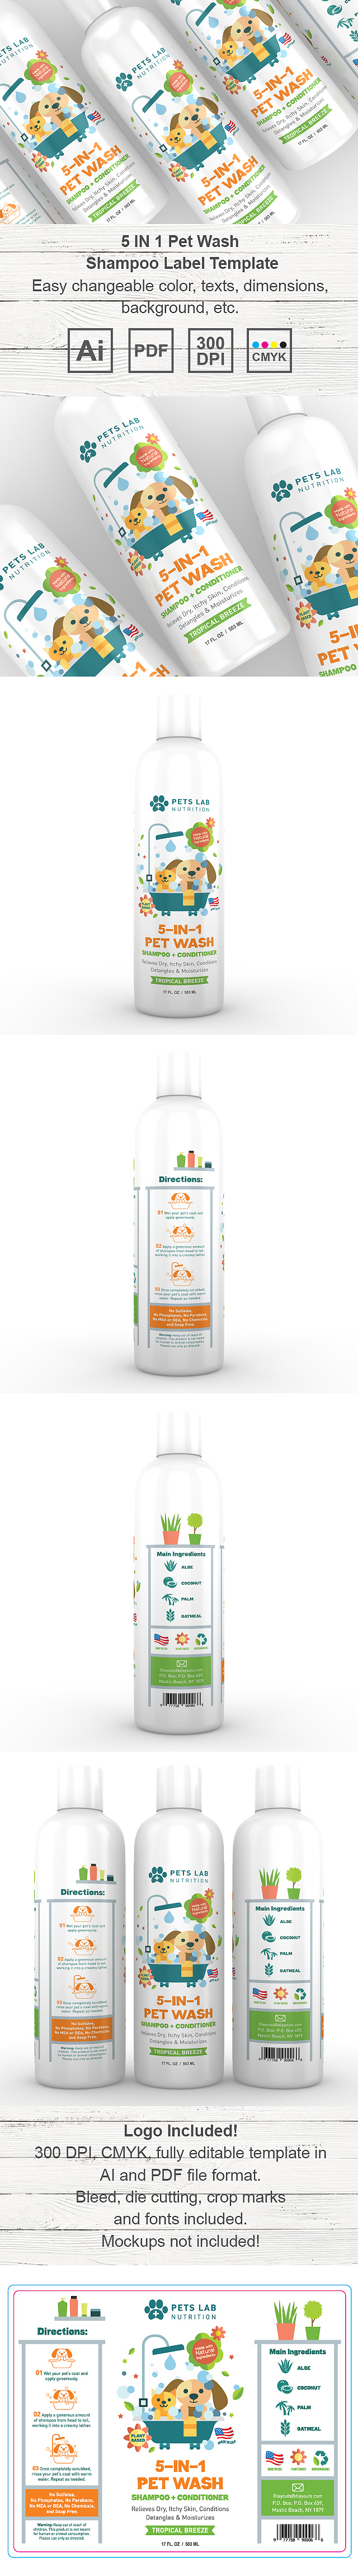 Pet Wash Shampoo Label Template